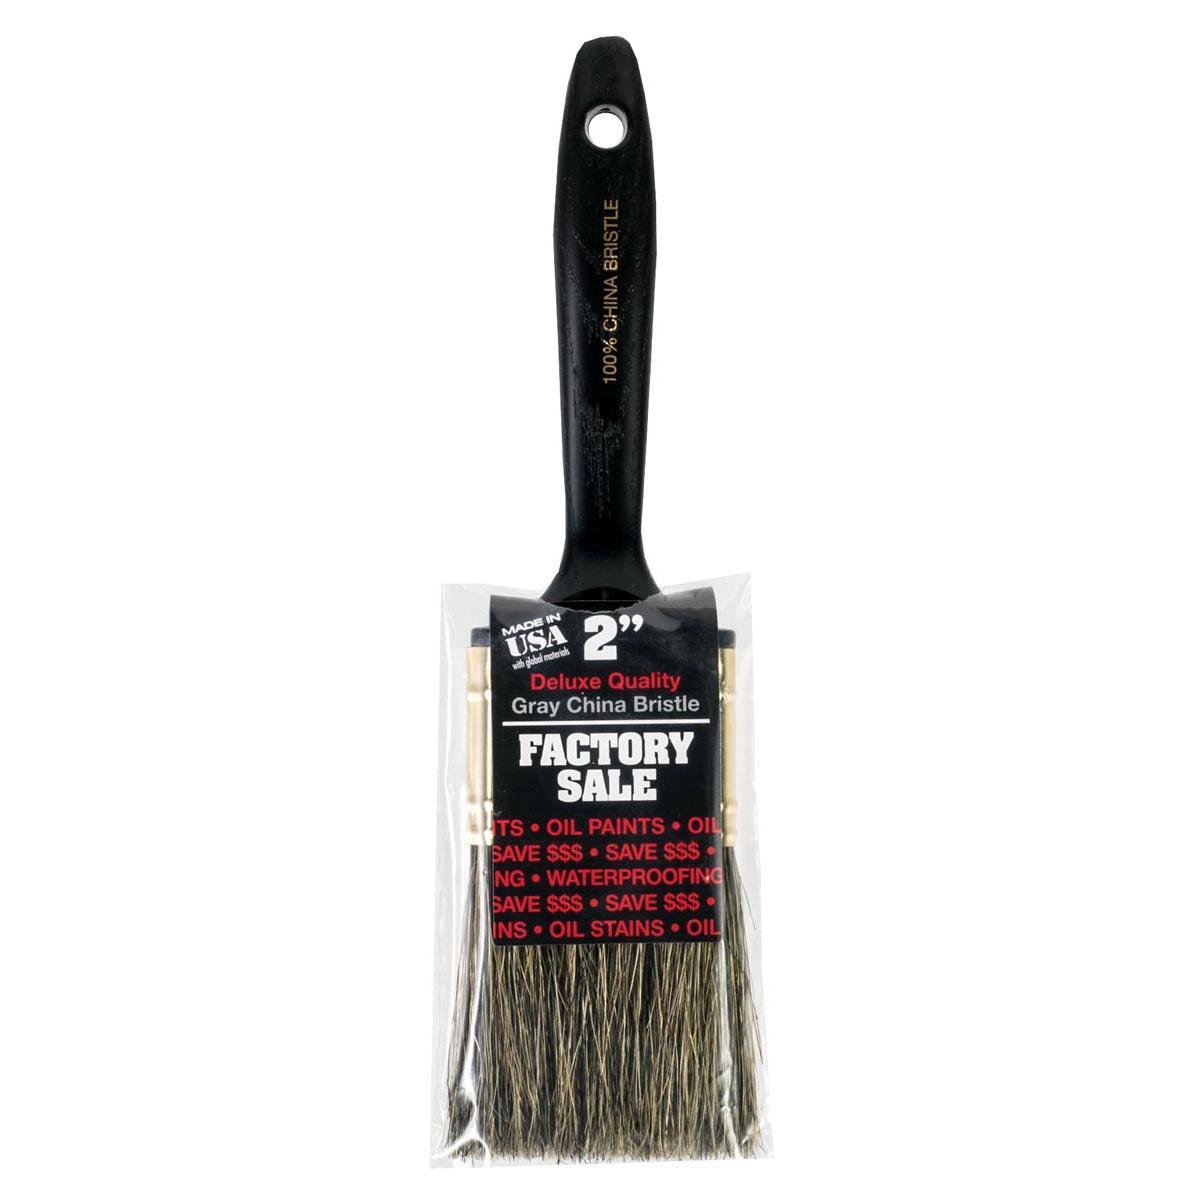 "2"" Factory Sale Gray China Bristle paintbrush"